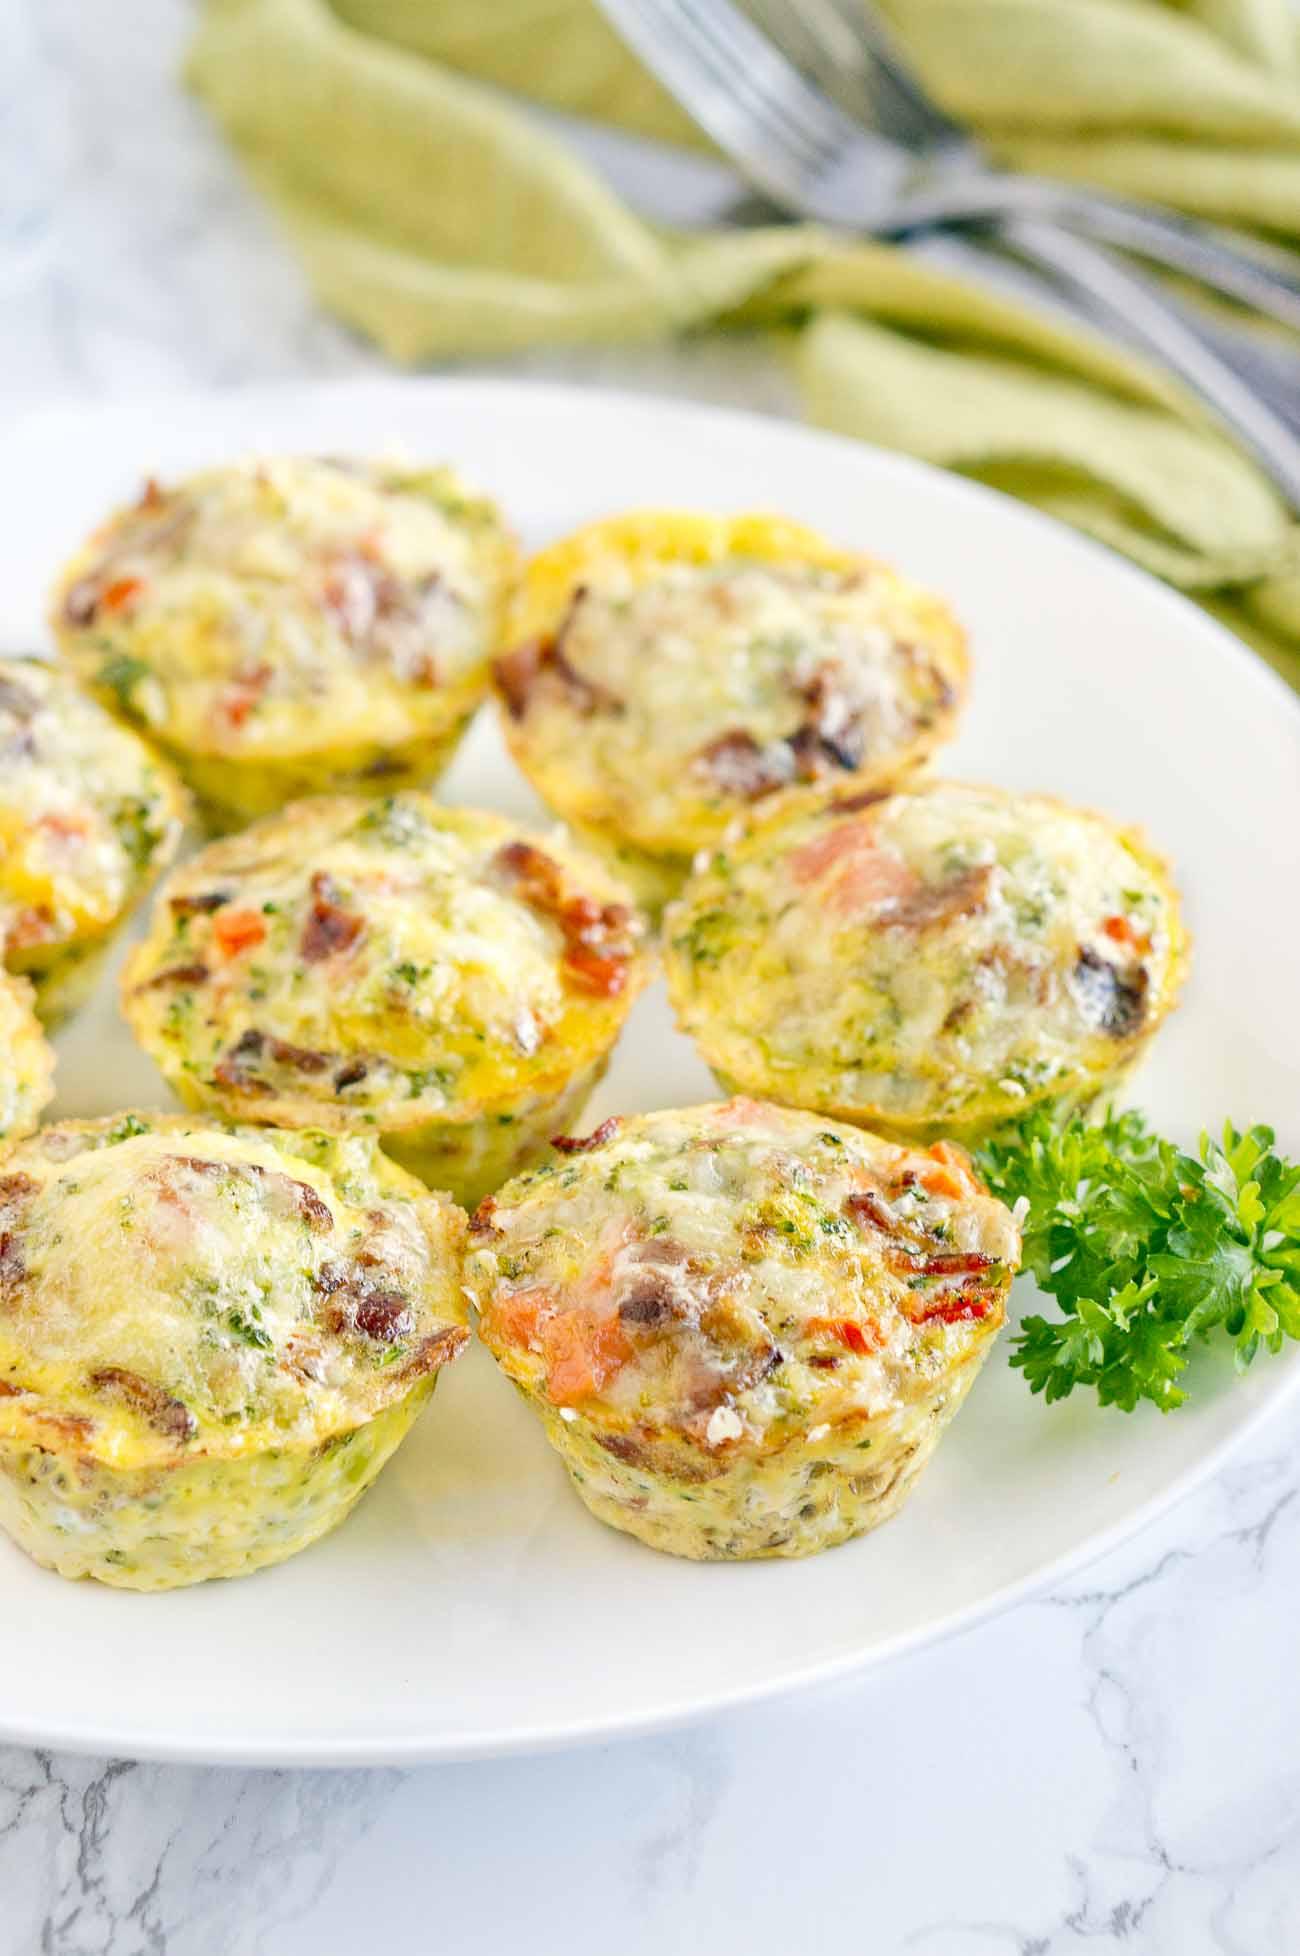 Healthy Weekend Breakfast  Easy Breakfast Egg Muffins